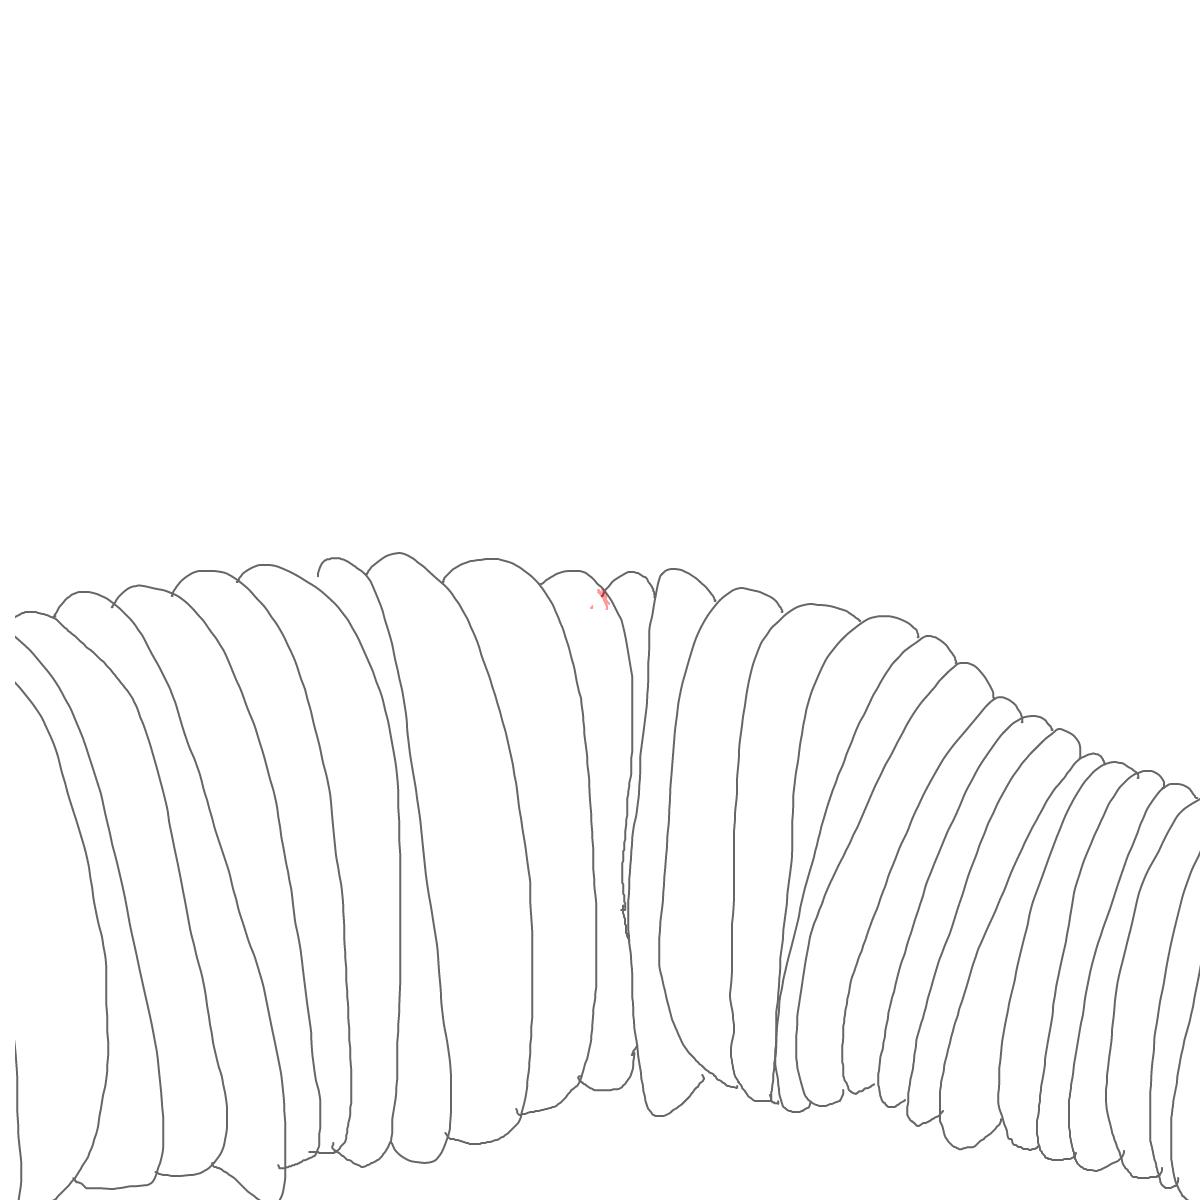 BAAAM drawing#24007 lat:52.4753112792968750lng: 13.4058122634887700